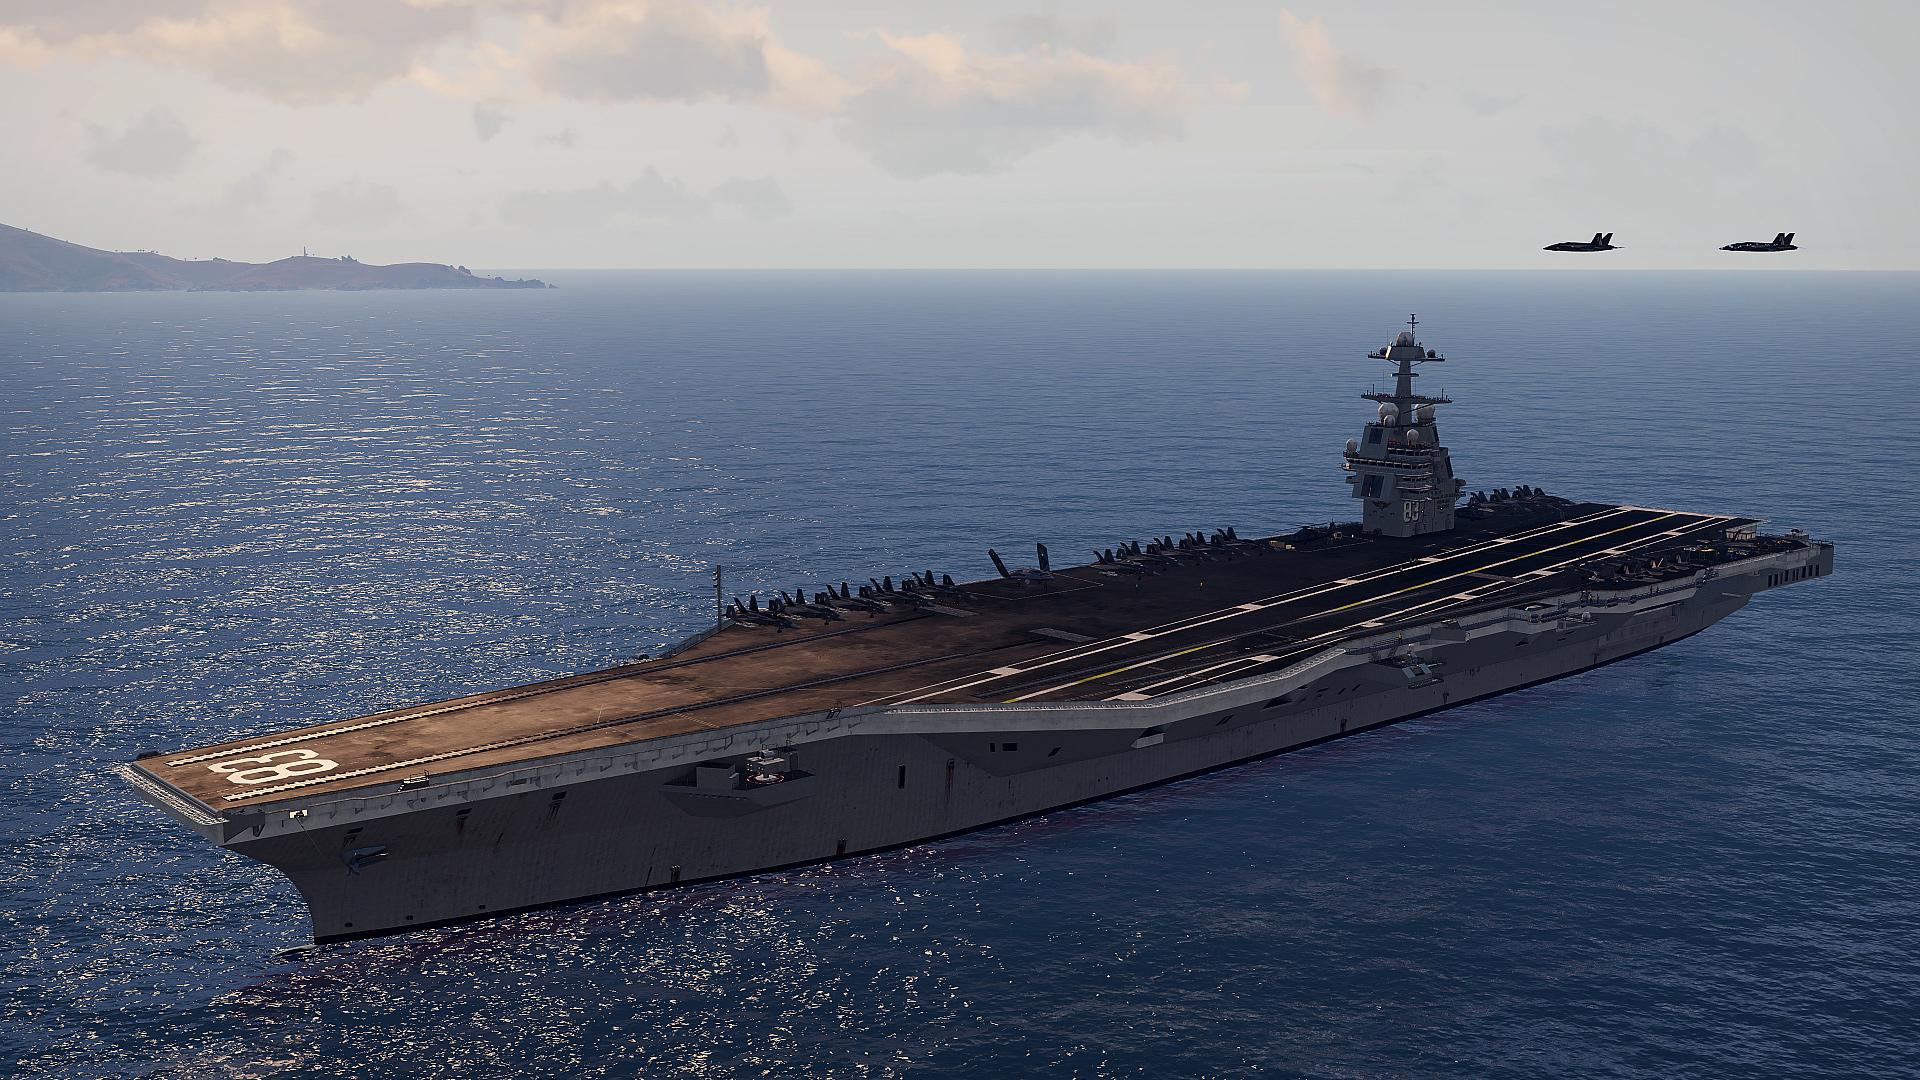 Armu 3 obohatí letadlová loď 142196